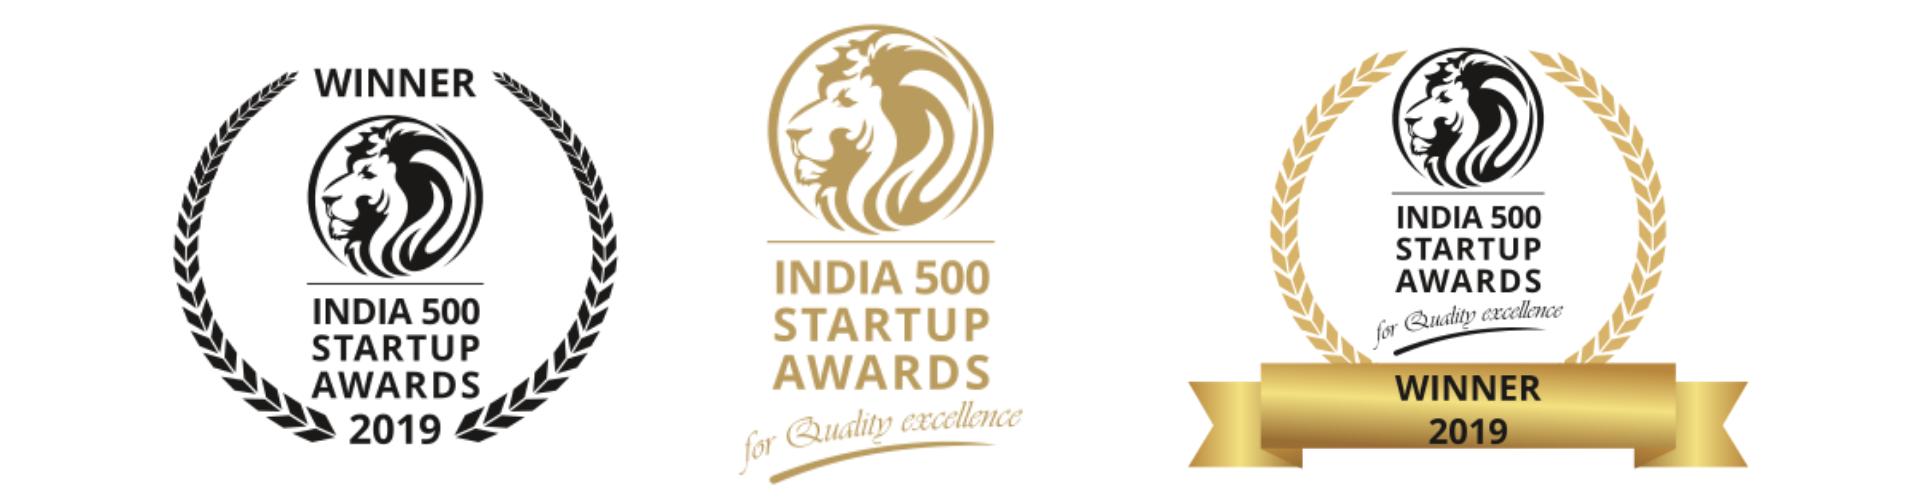 ridaex startup award 2019